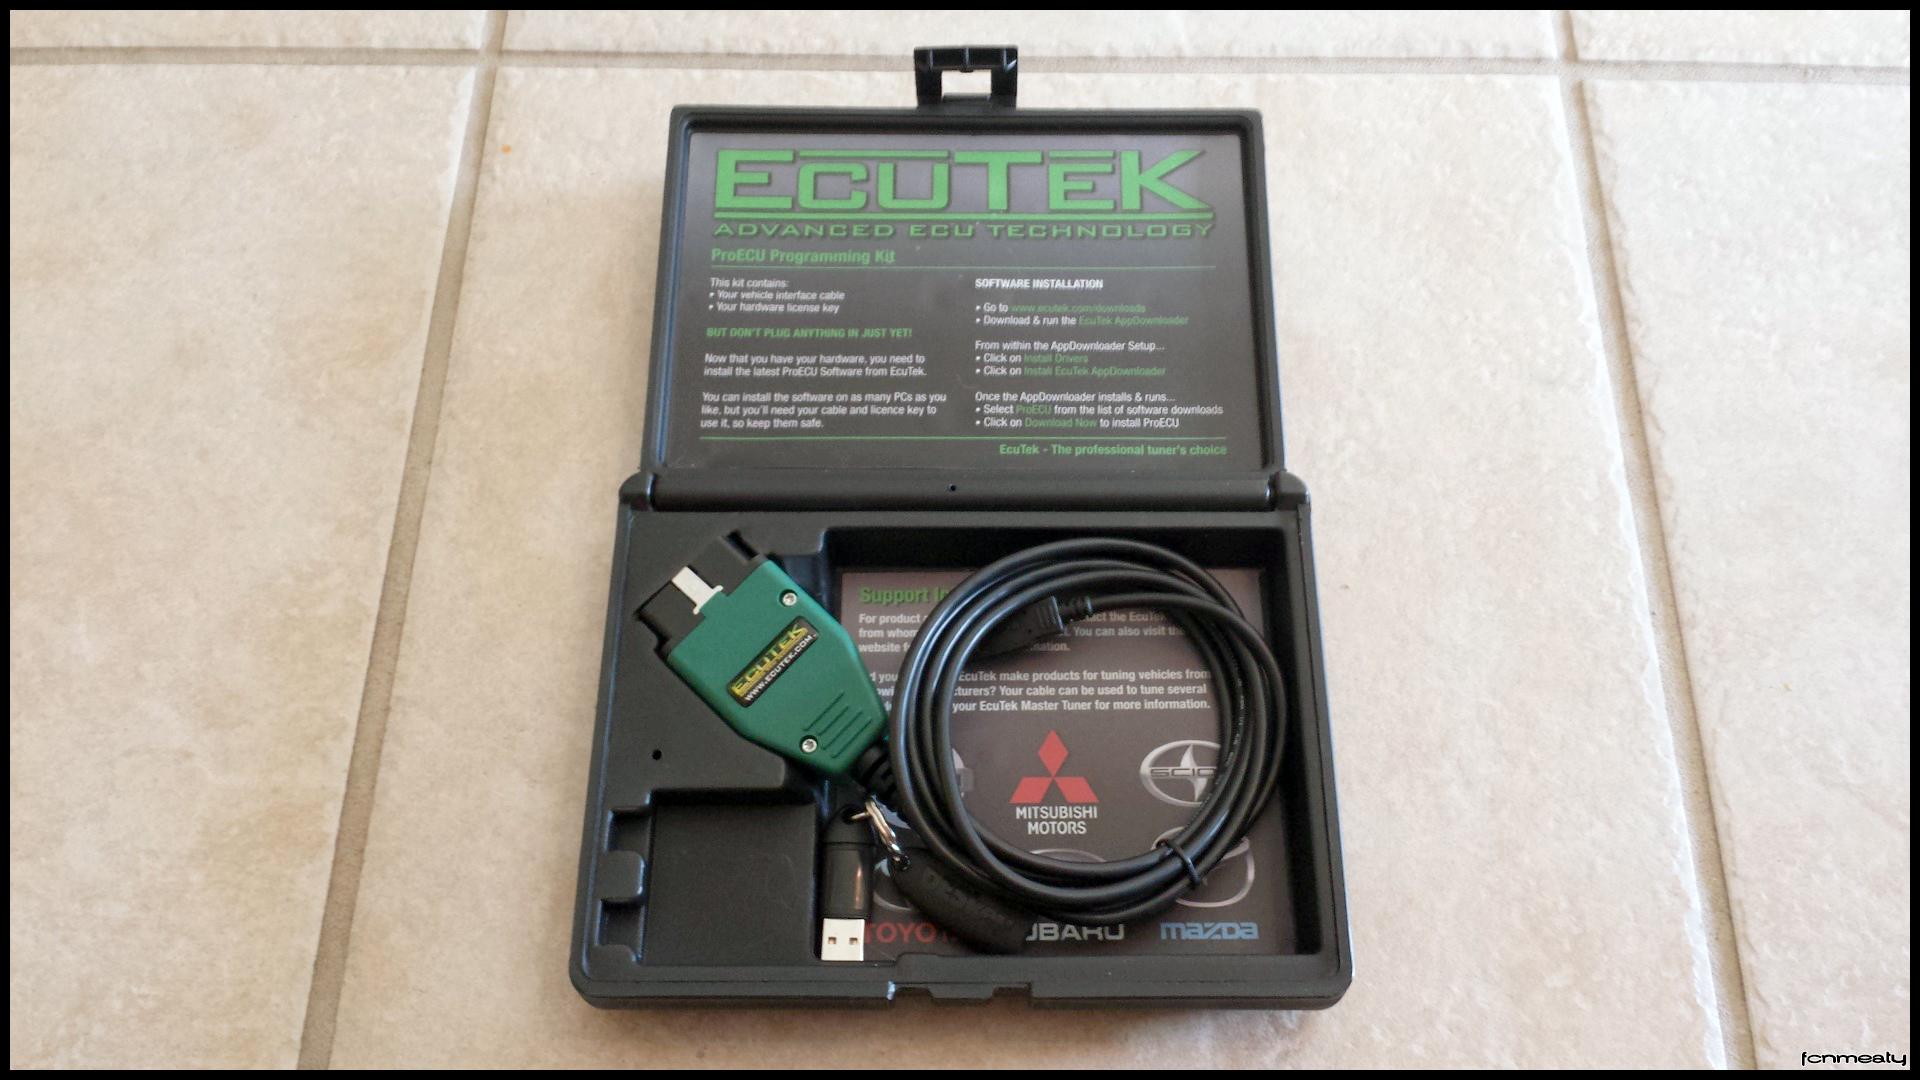 http://i.rideekulo.us/sti/build/phase3/20140706/ecutek.jpg